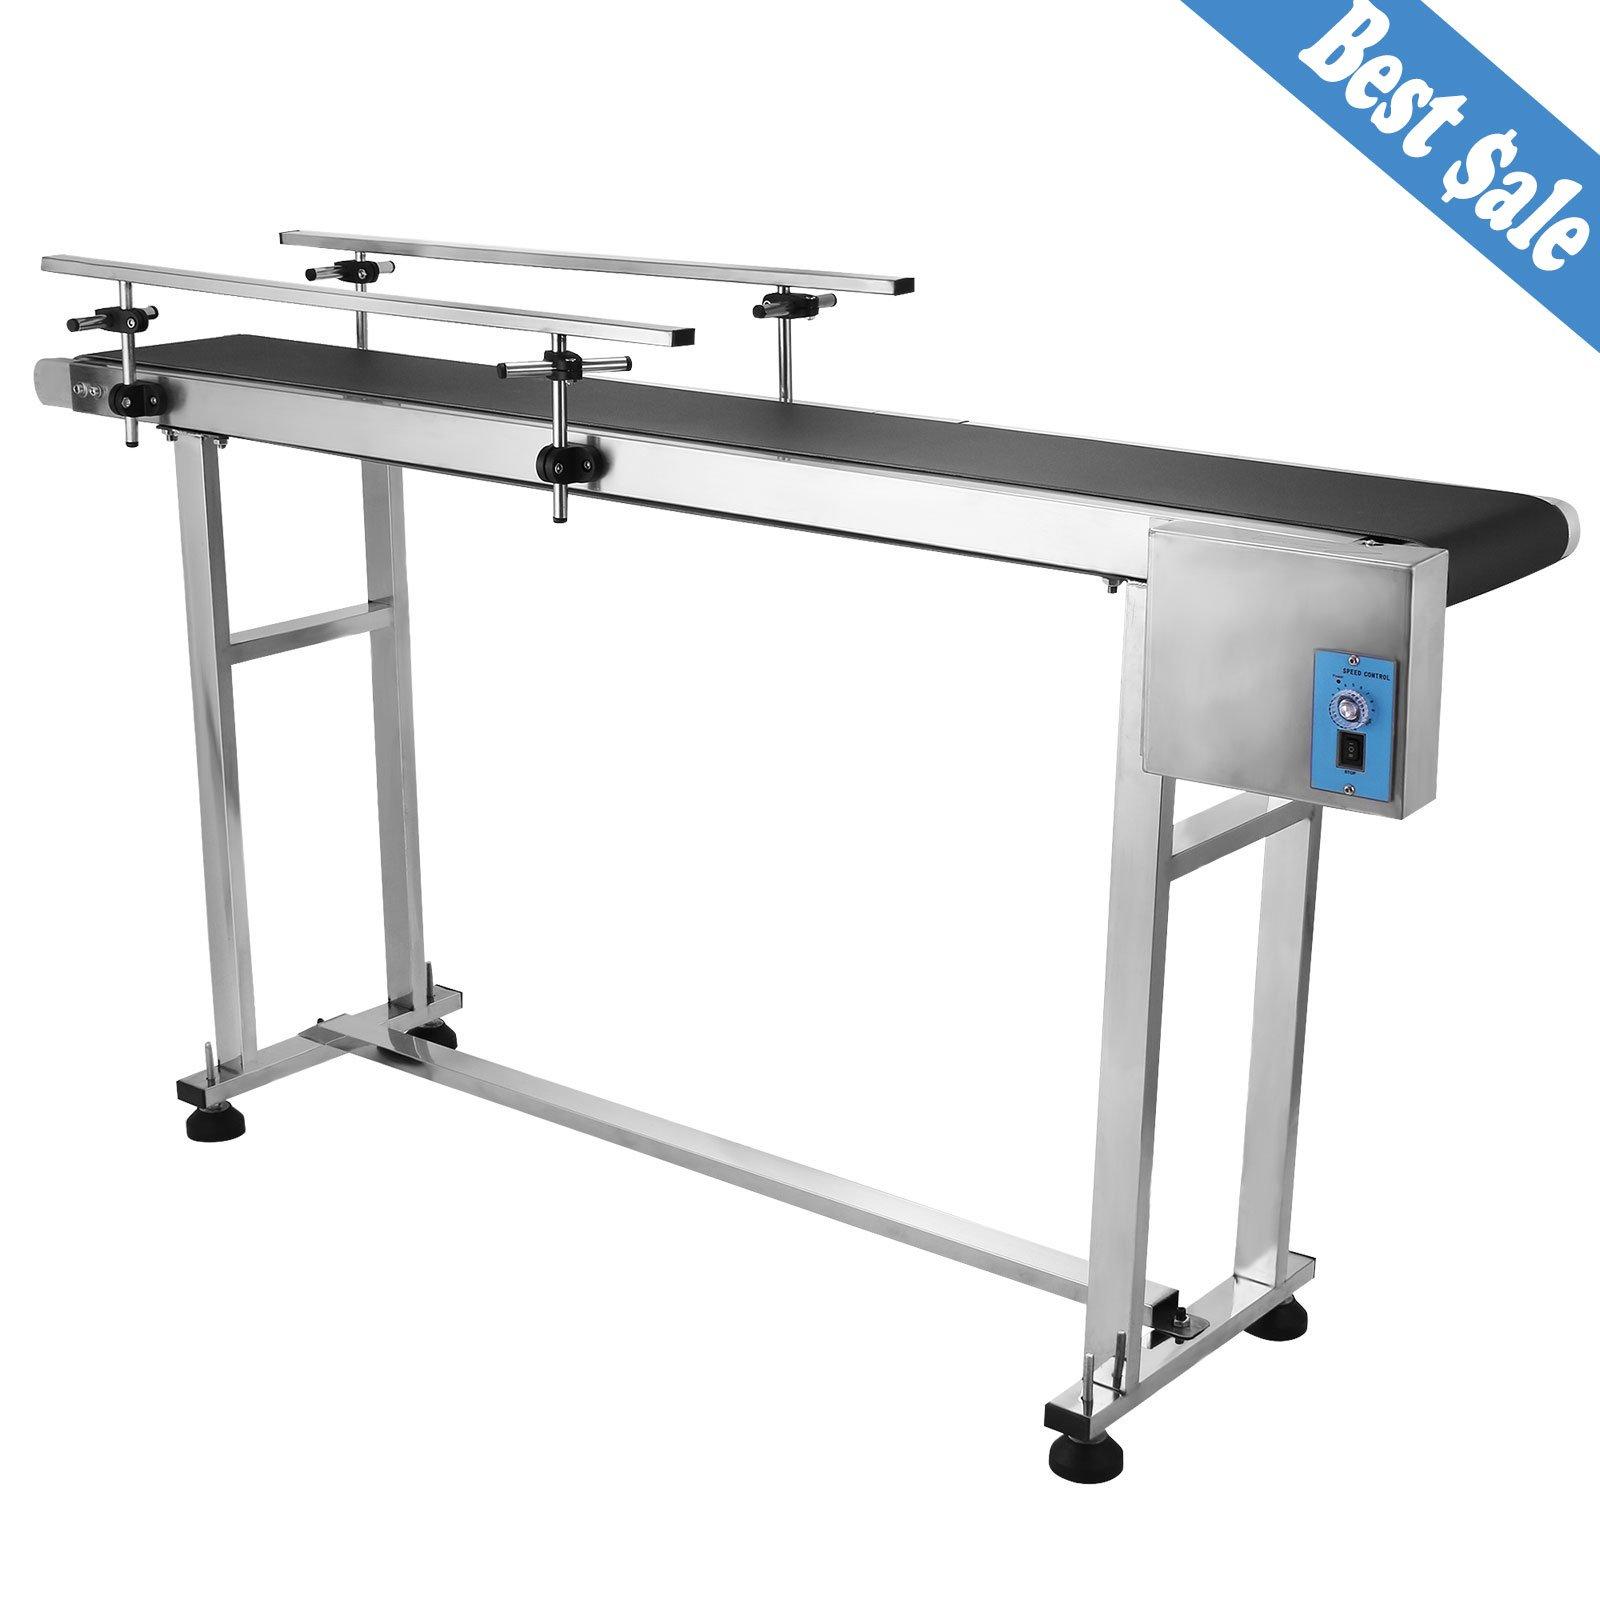 OrangeA Belt Conveyor 59 x 7.8 inch Adjustable Conveyor Table 0-82 ft/min Conveyor Belt Stainless Steel Motorized Anti-static PVC Belt with Double Guardrail